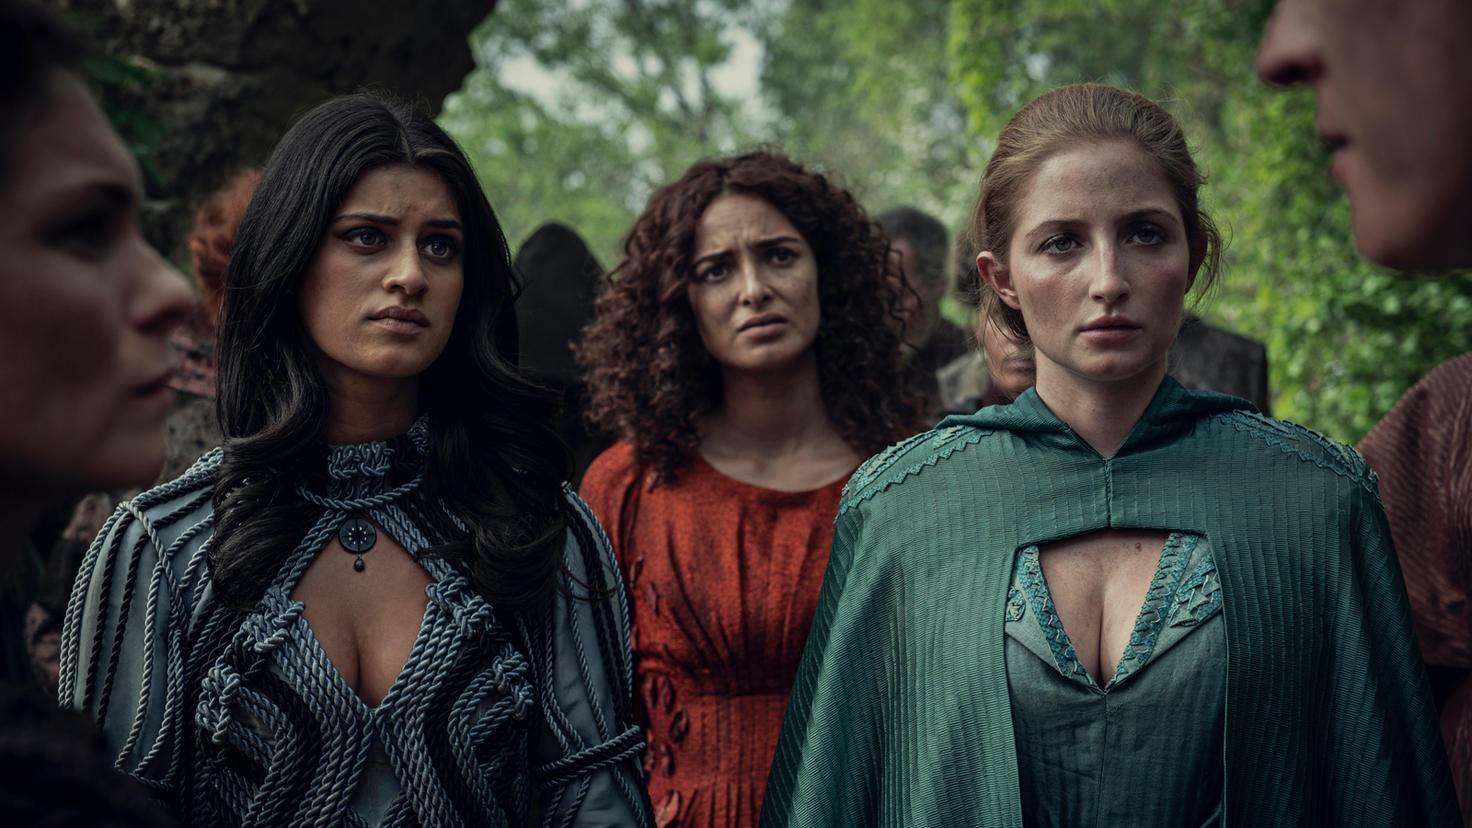 The Witcher Triss Merigold